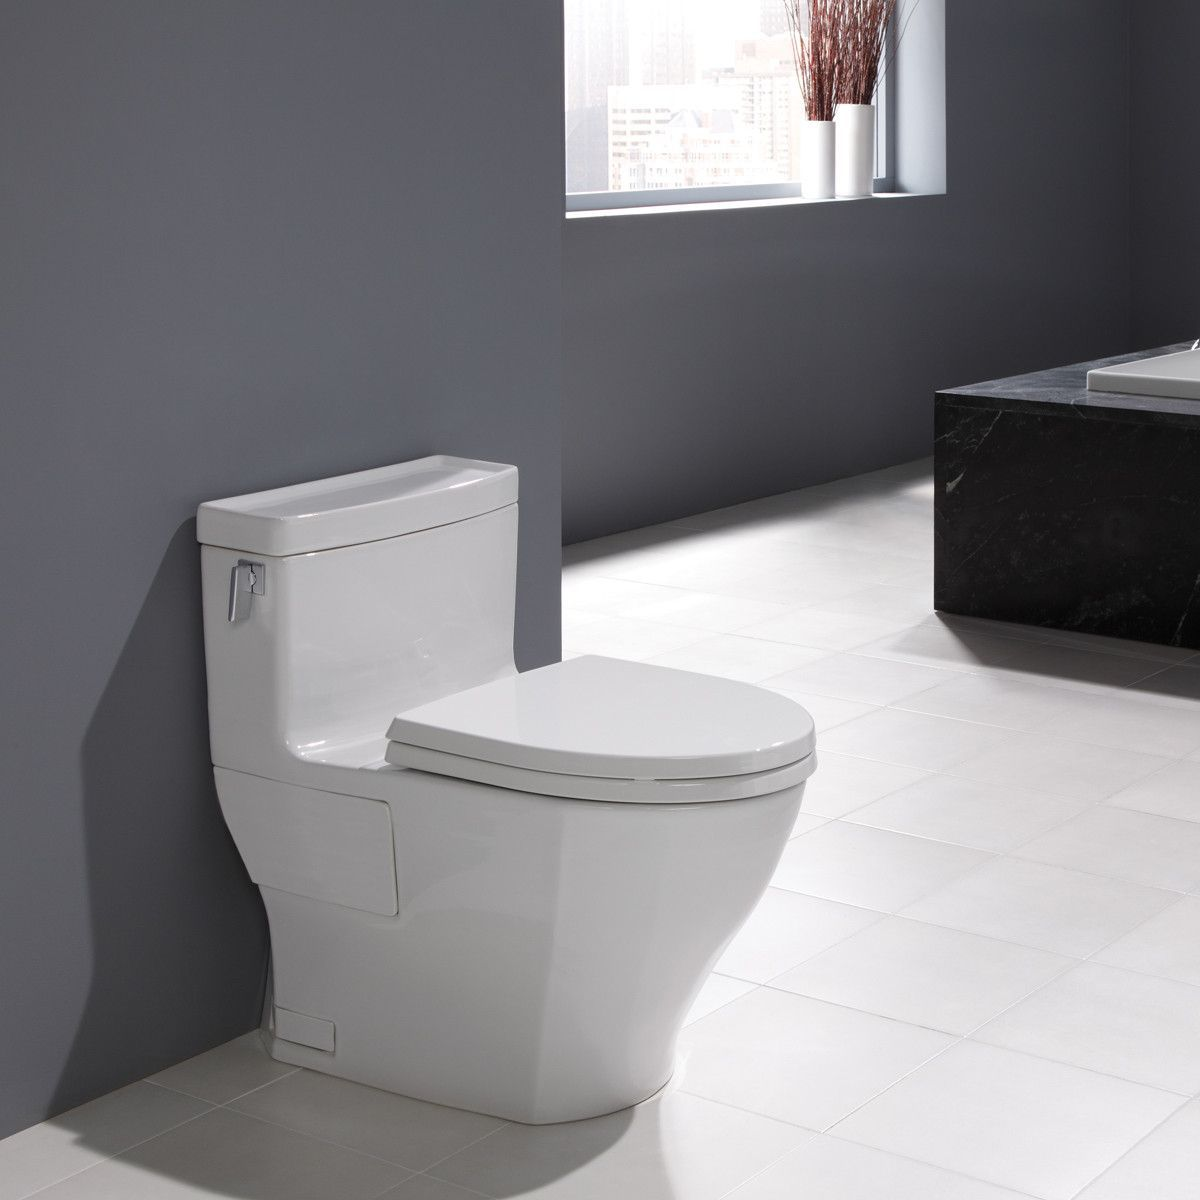 TOTO MS624214CEFG#01 Legato One-Piece Toilet, 1.28GPF, Elongated ...